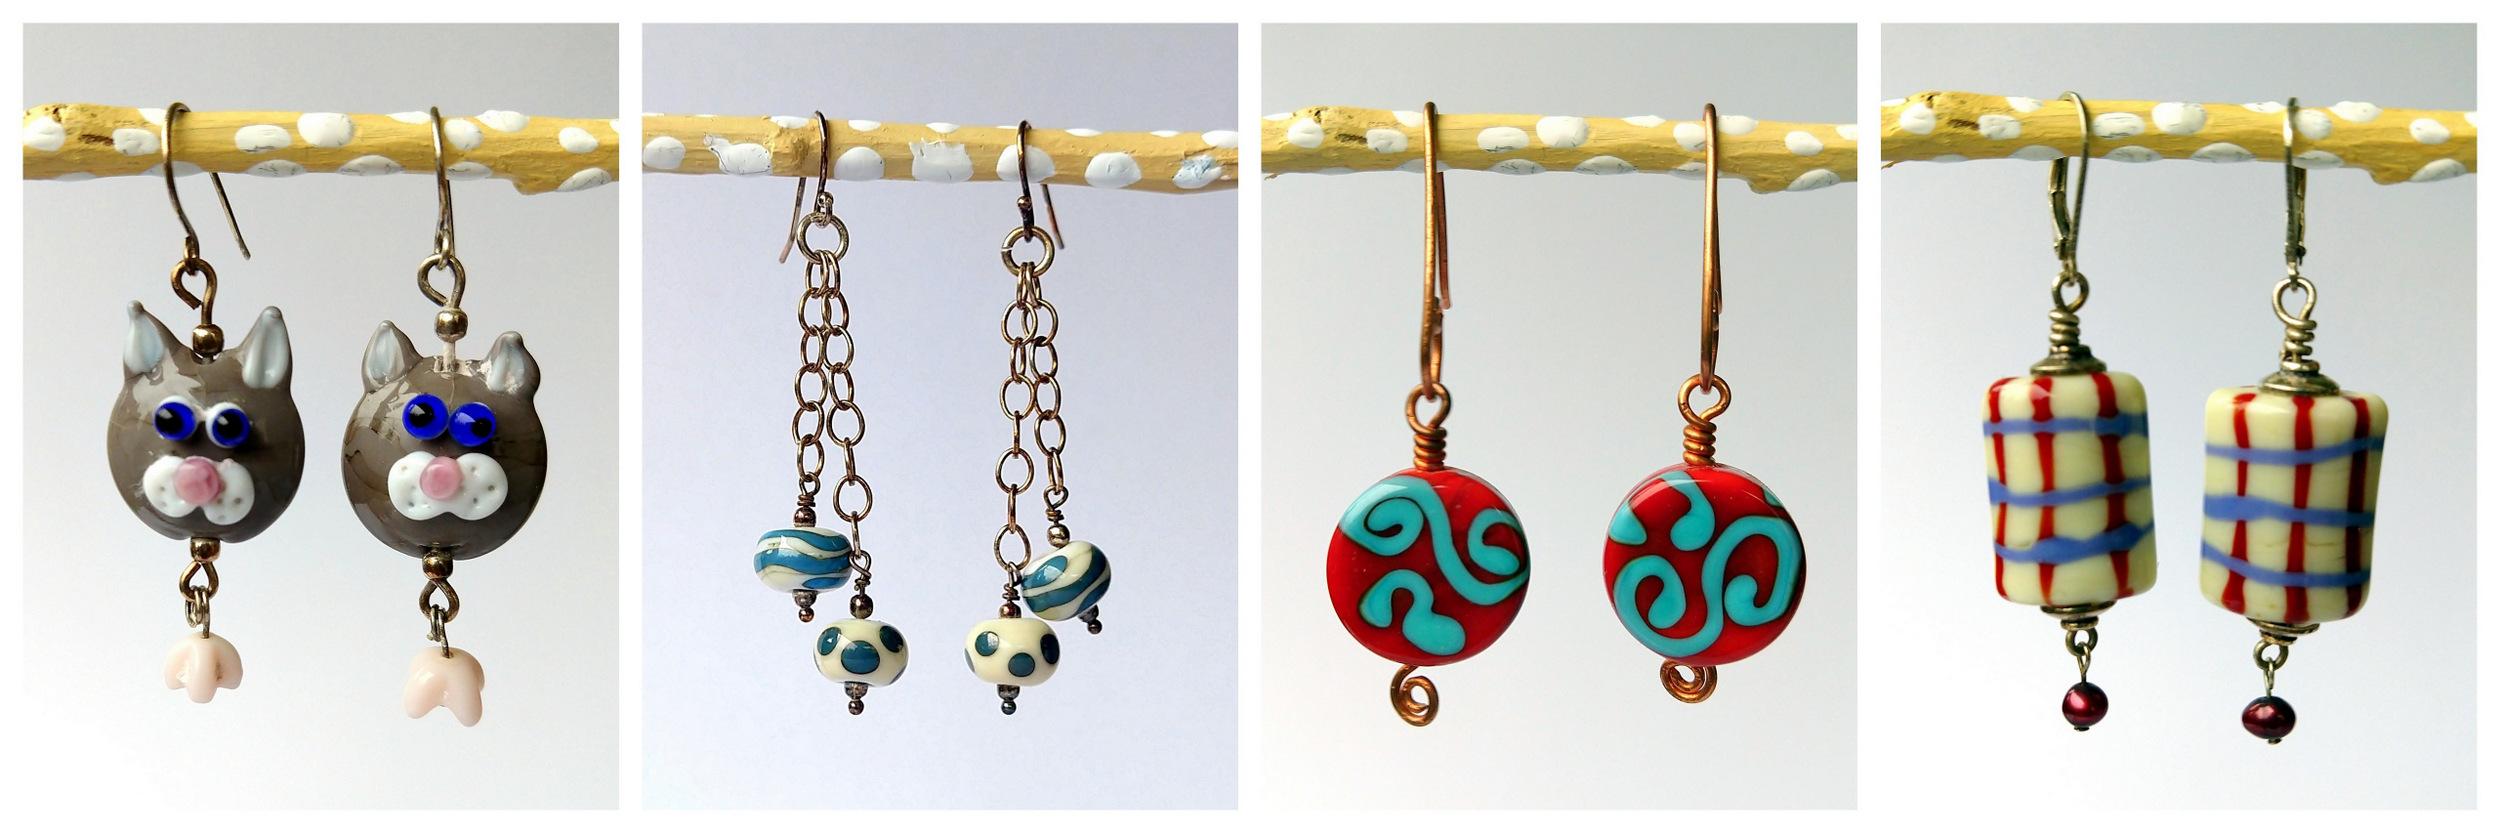 Glass Bead Earrings, Handmade, Bitty Bits Mosaics-001.jpg